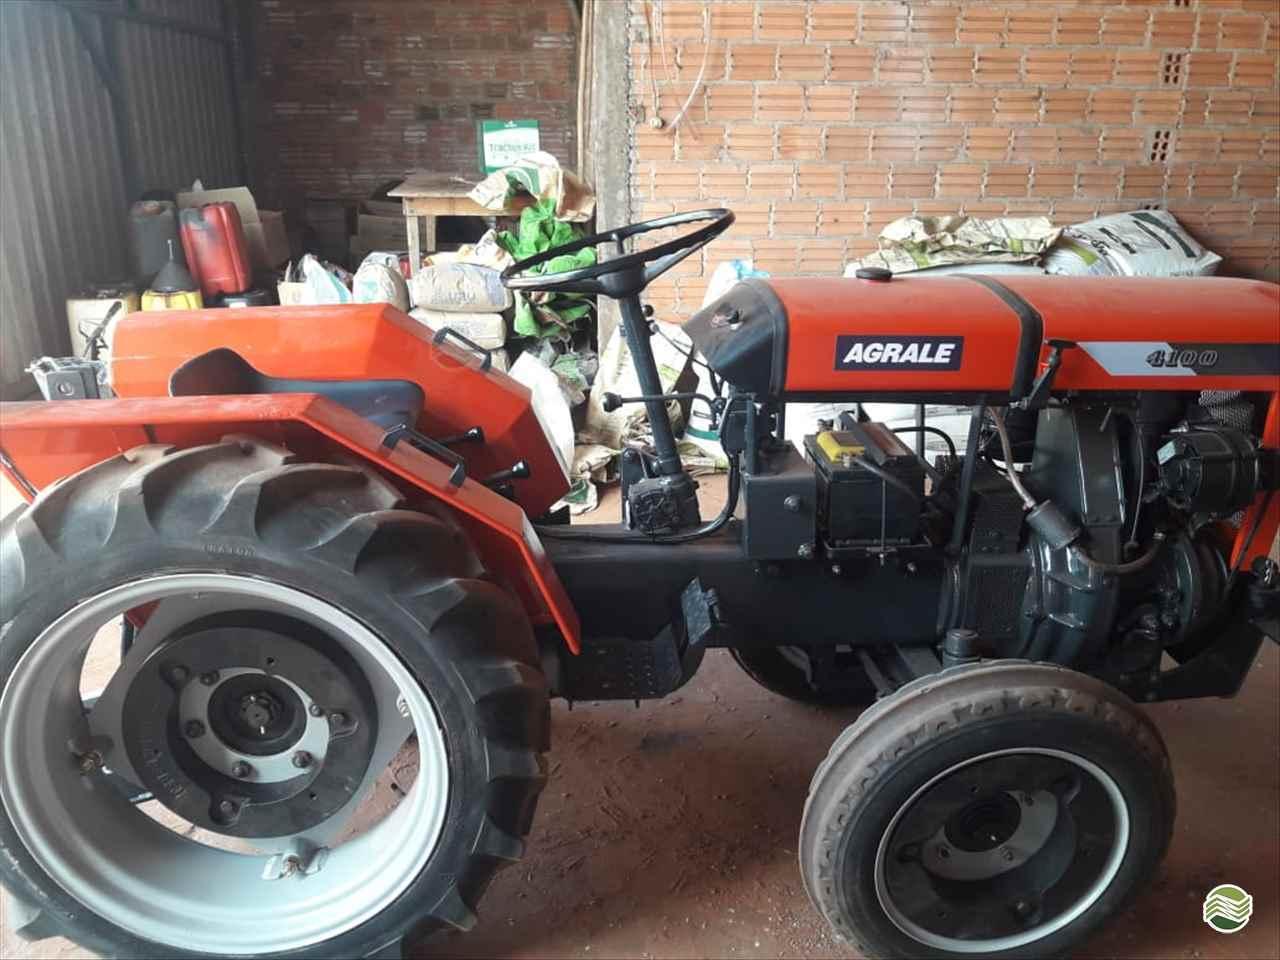 AGRALE AGRALE 4100  1975/1975 Camtrac Máquinas Agrícolas